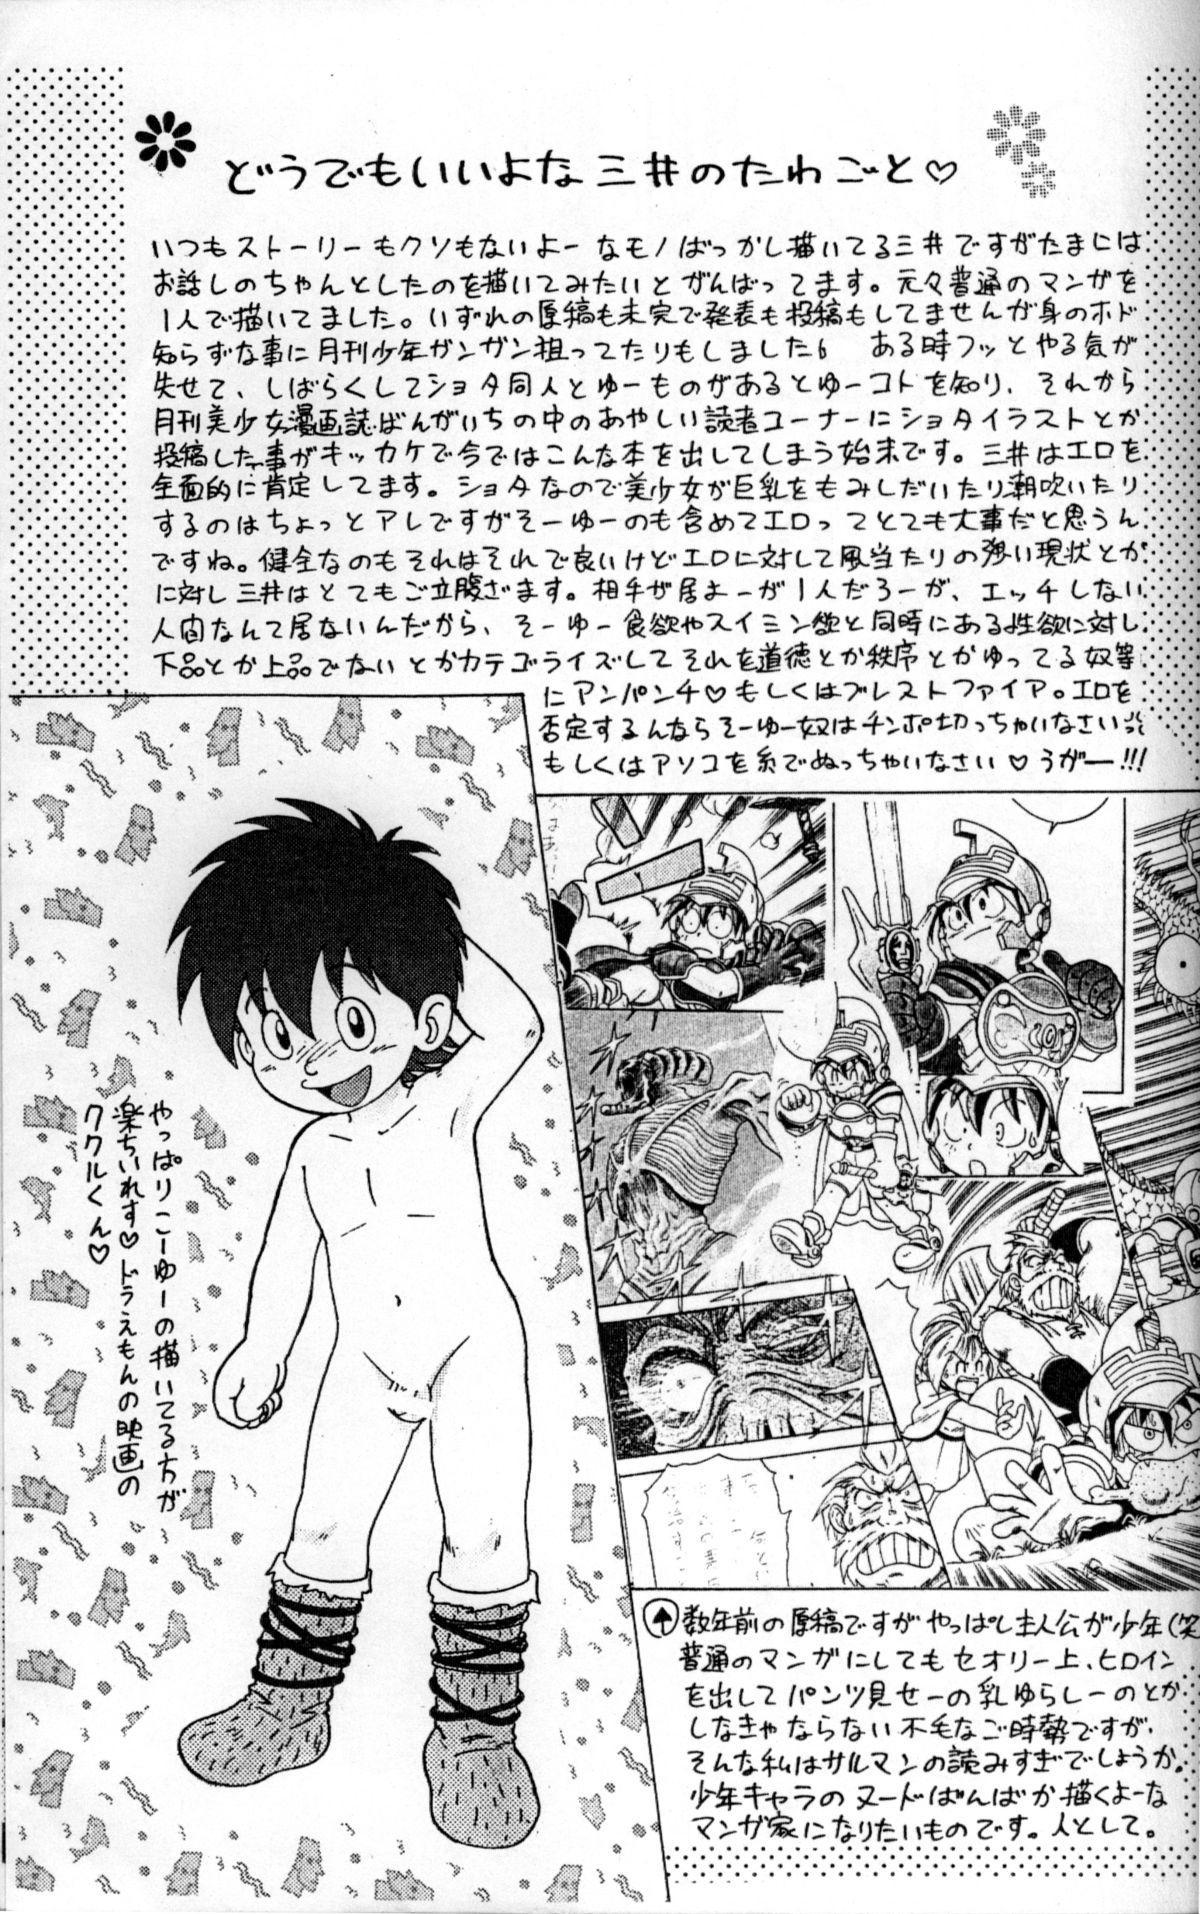 Mitsui Jun - Dreamer's Only - Anime Shota Character Mix 13